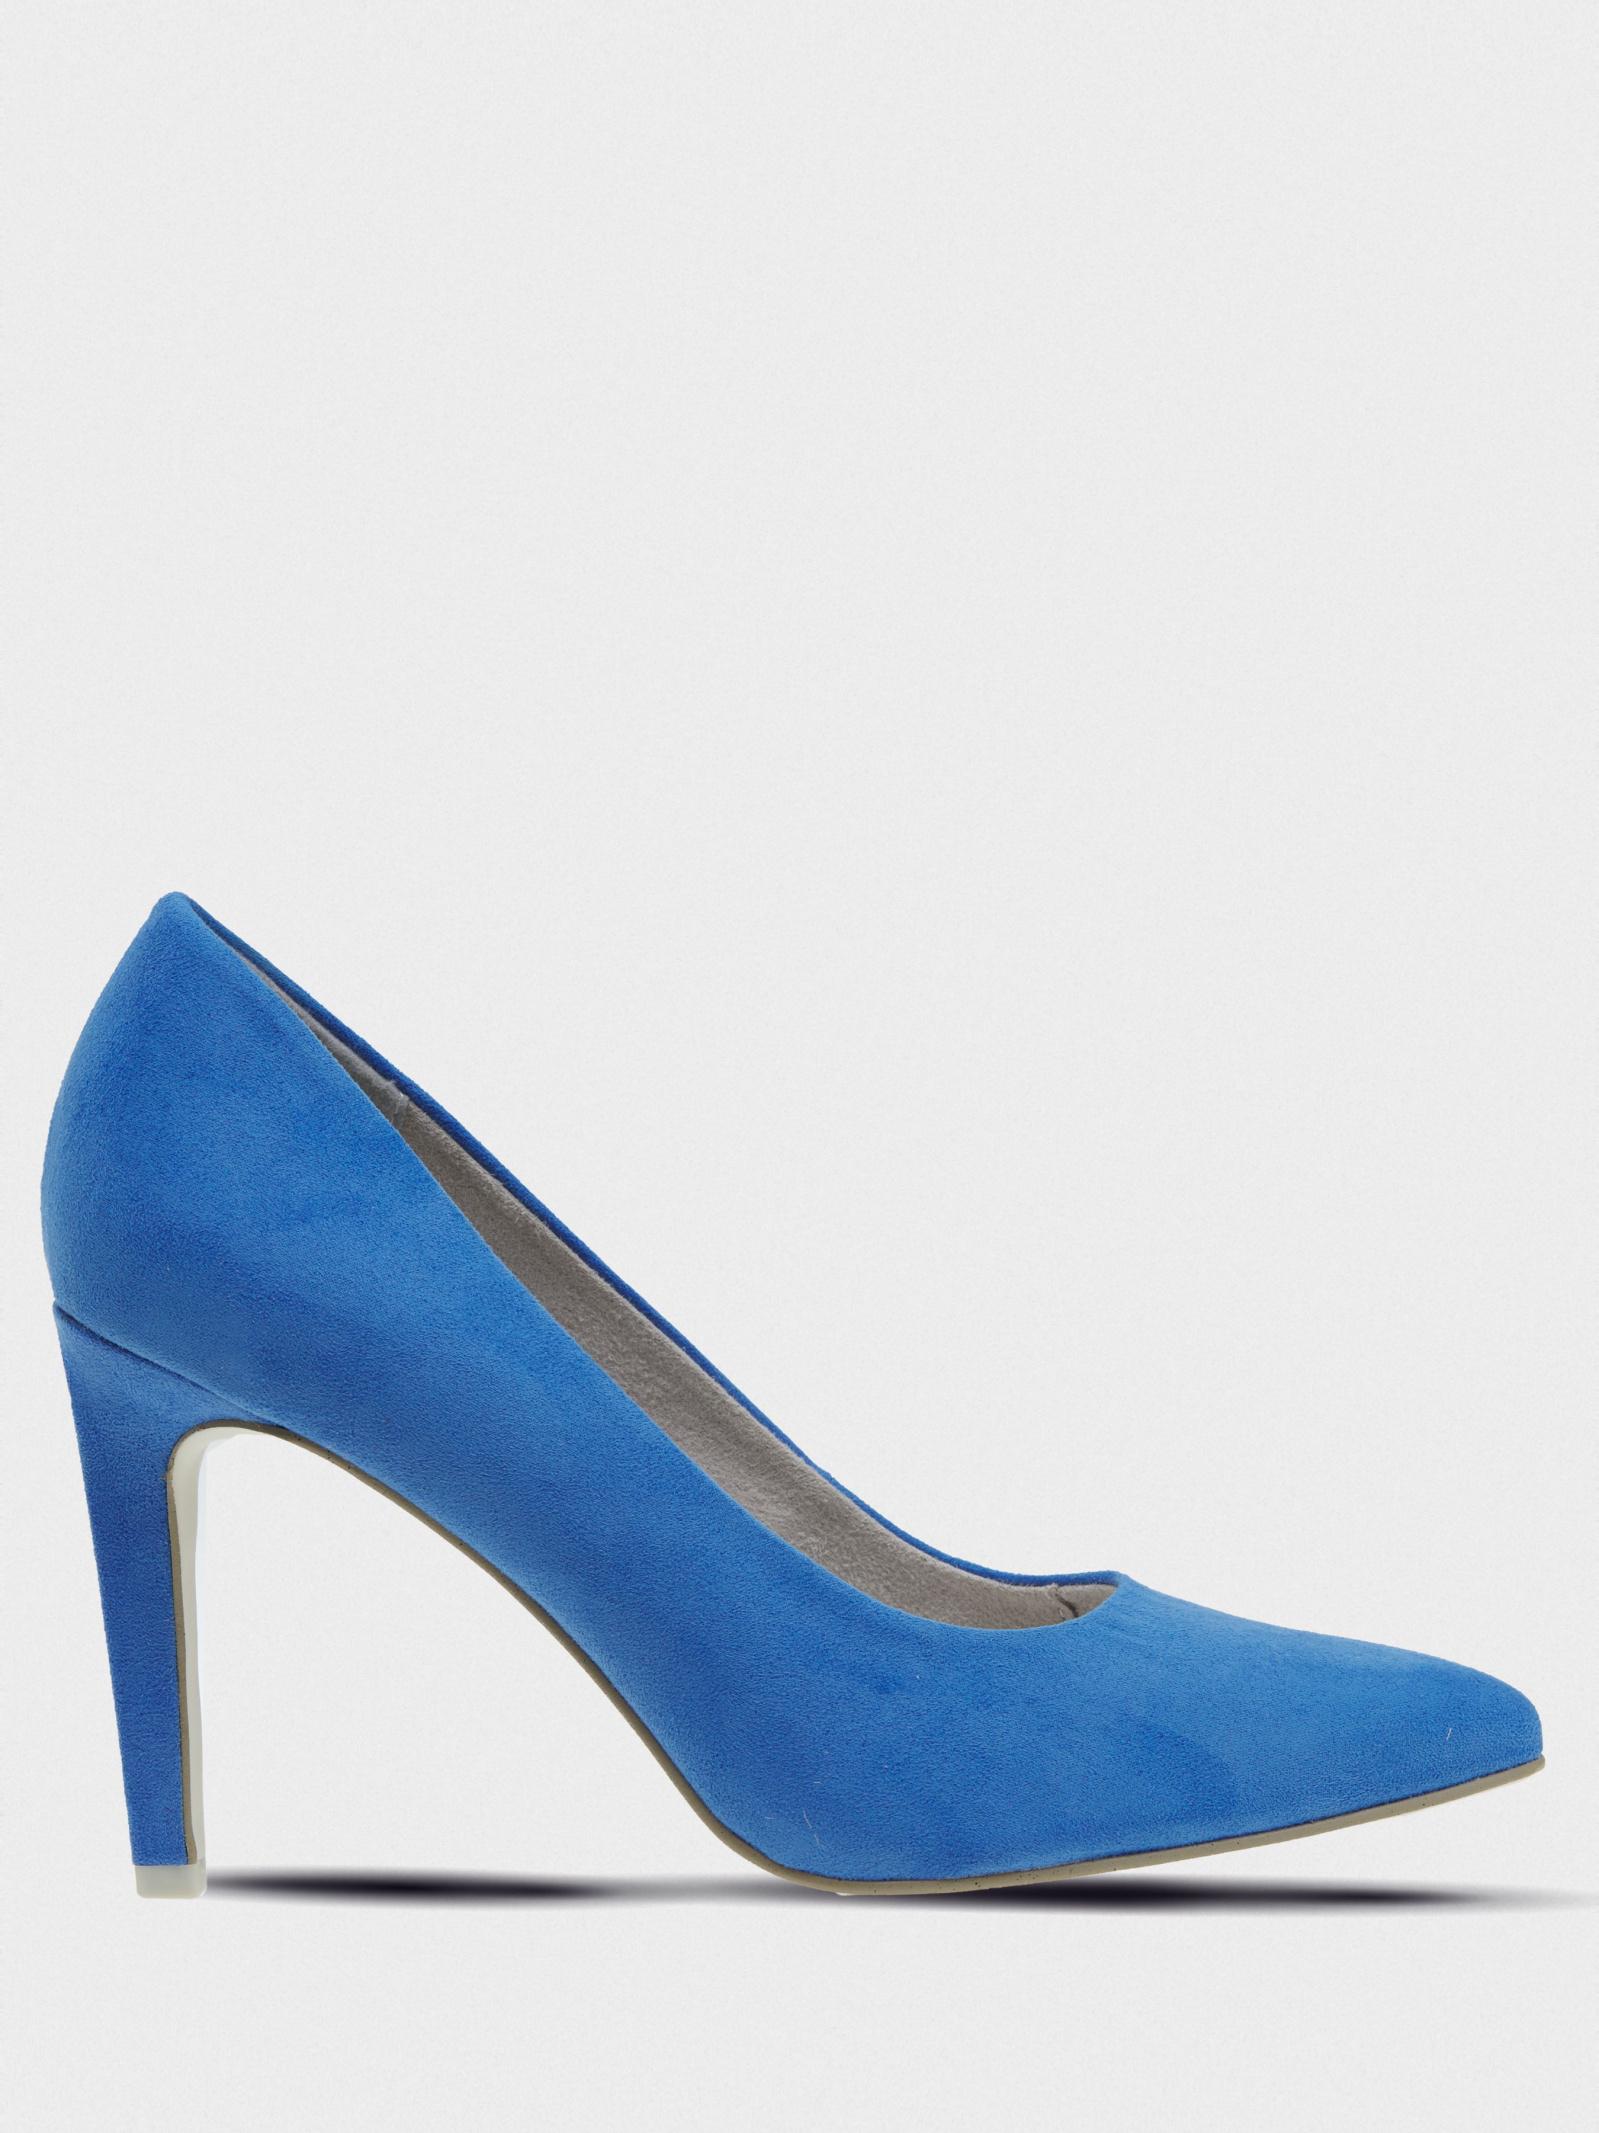 Туфли женские Marco Tozzi 3H309 цена, 2017